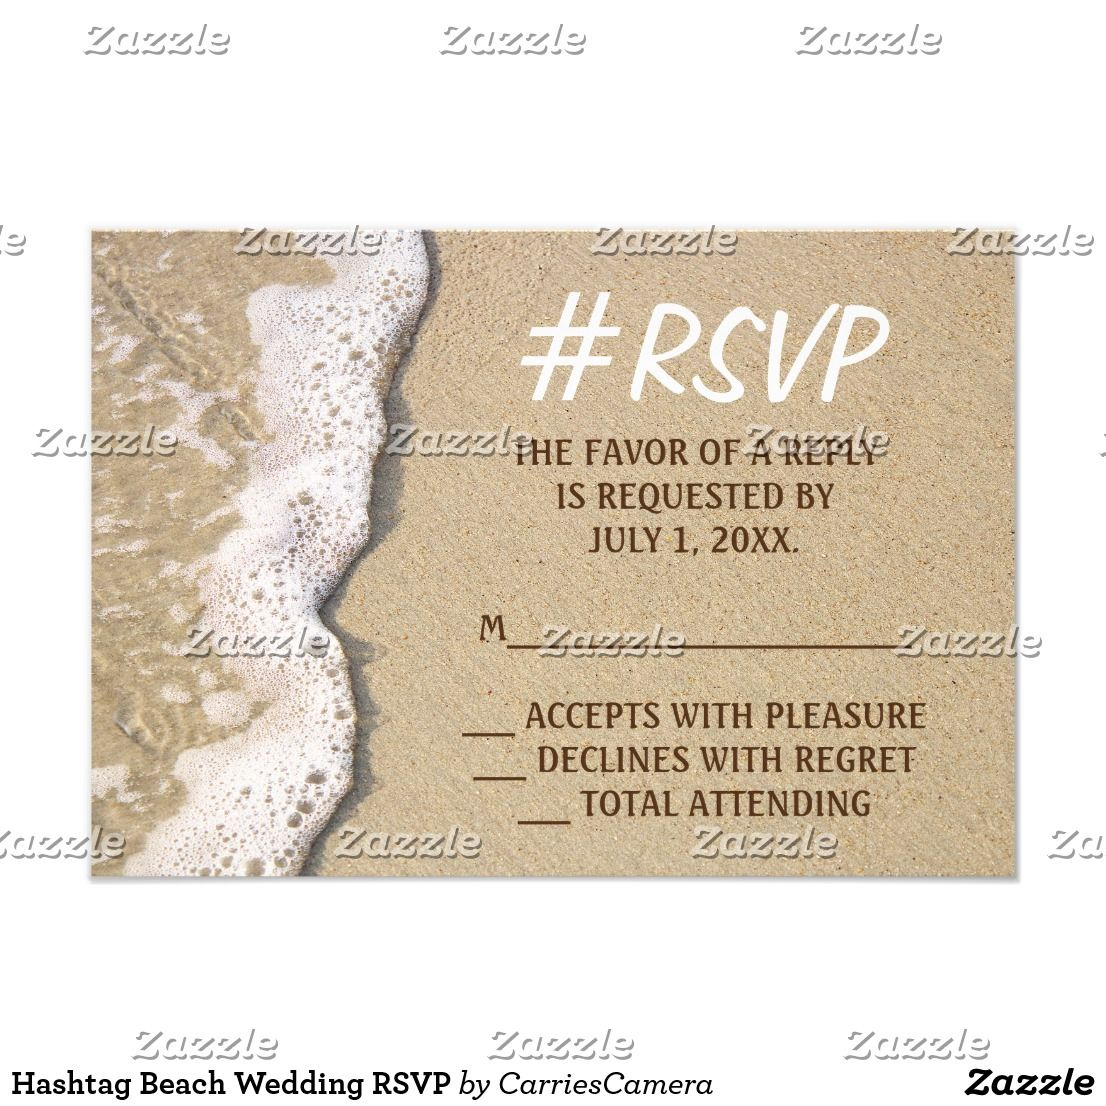 Hashtag Beach Wedding RSVP Wedding rsvp